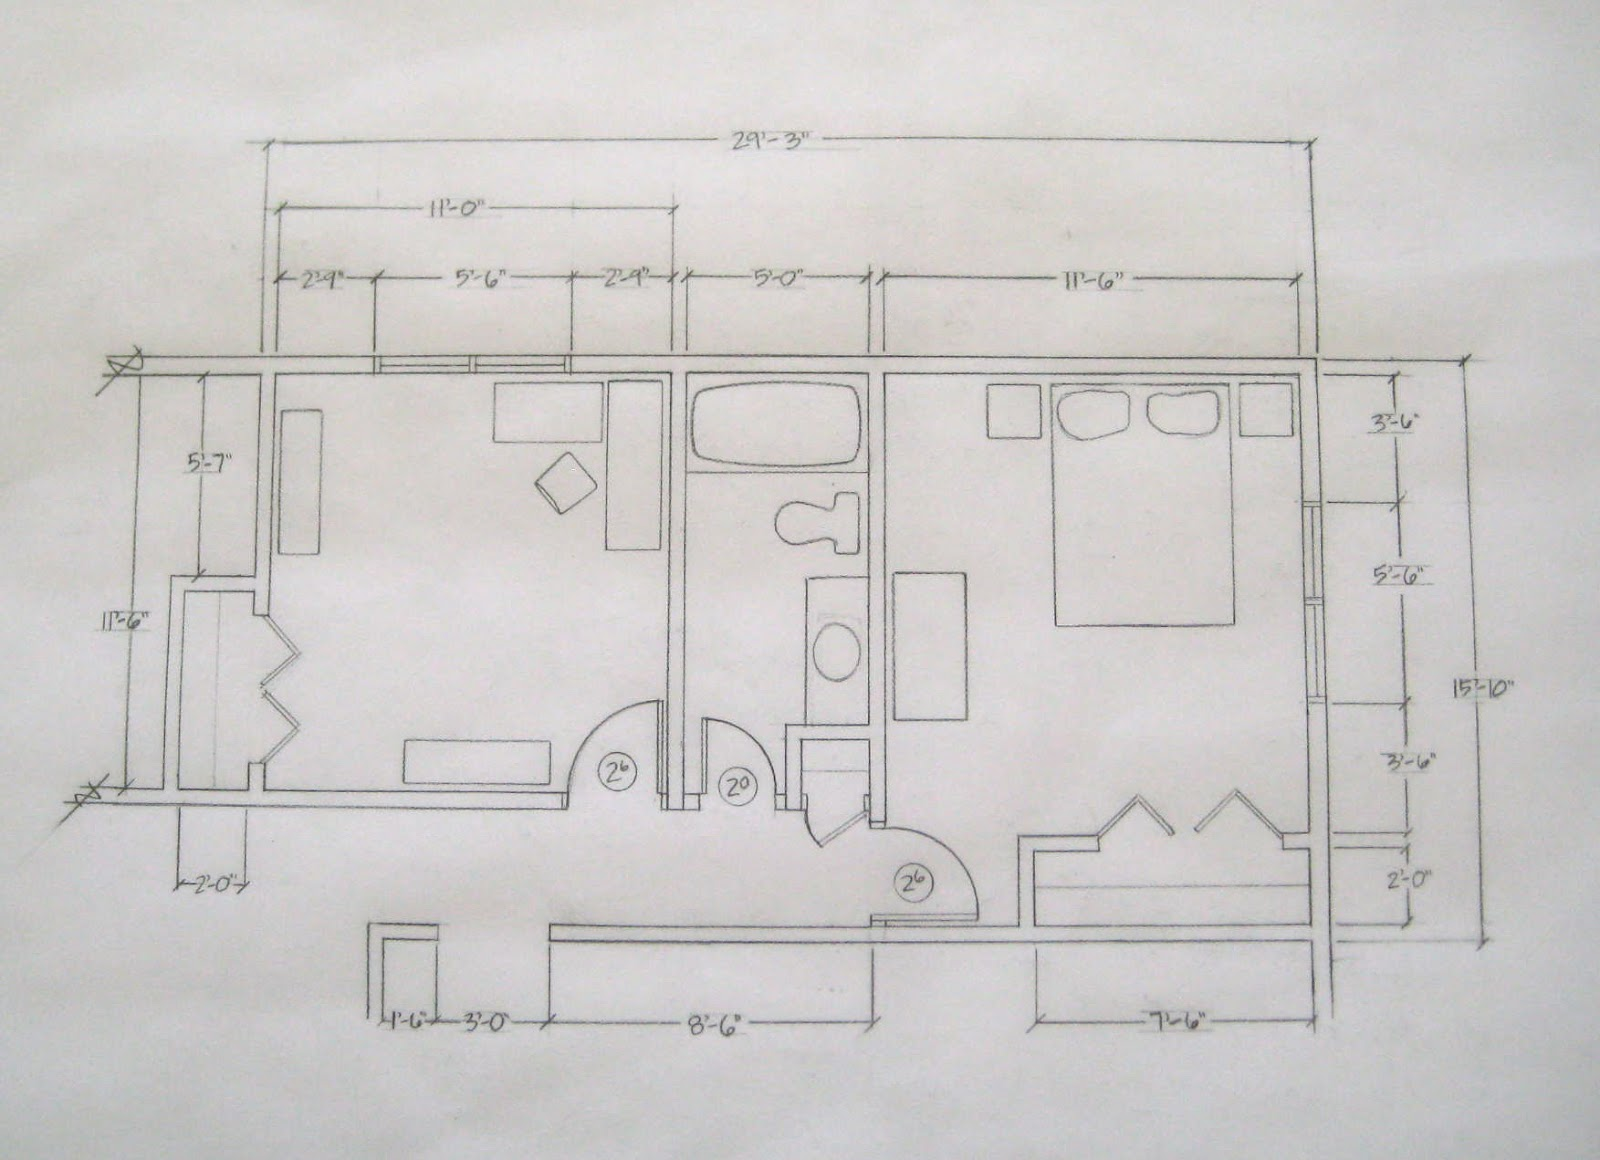 Interior design course pictures best home decorating ideas for Interior design 6 months course